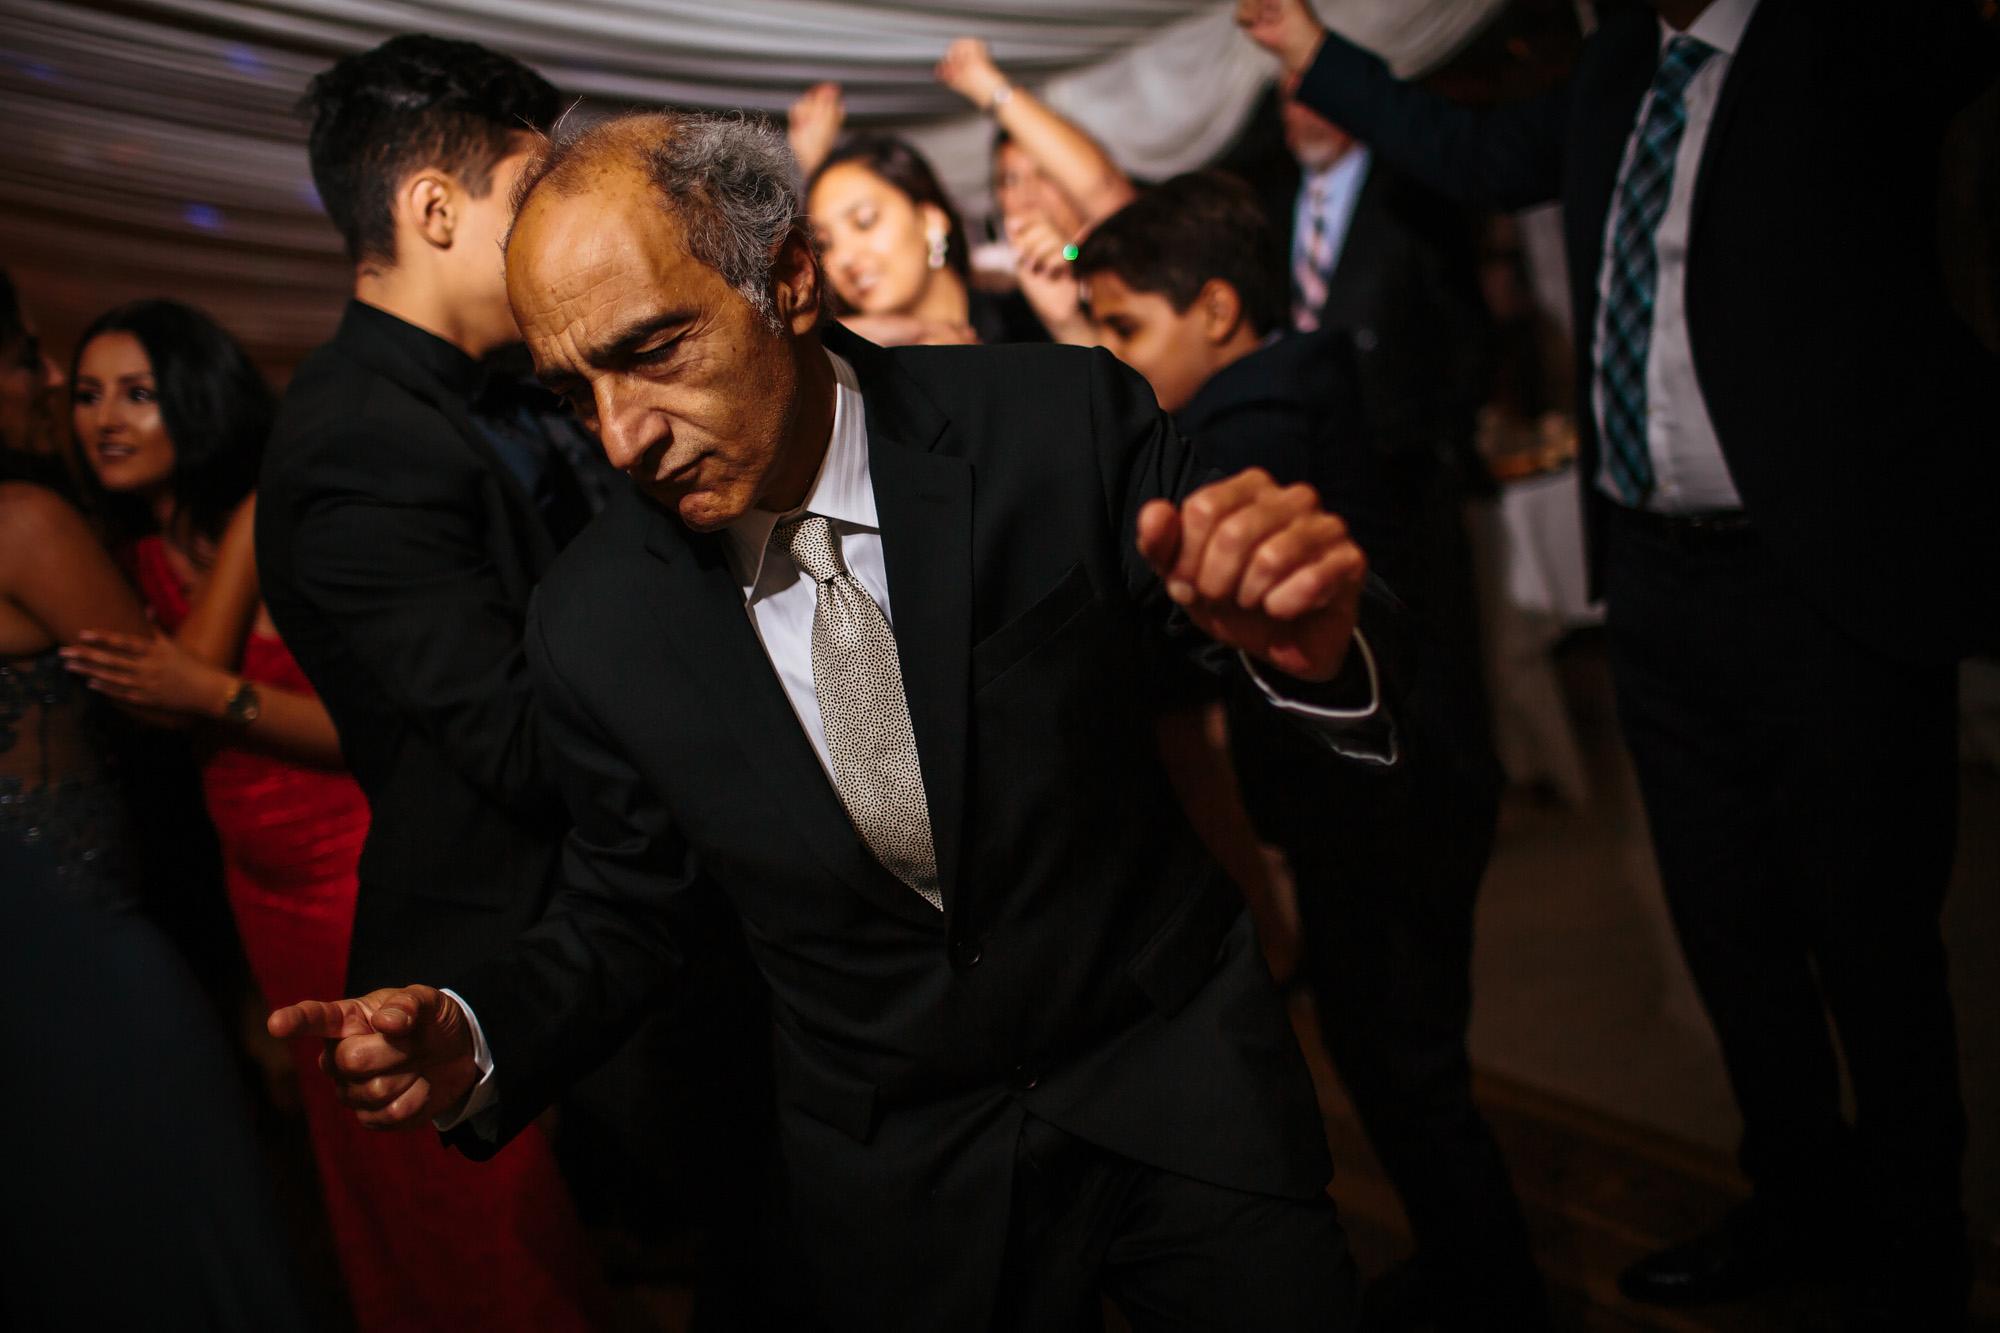 Guest dances at a wedding